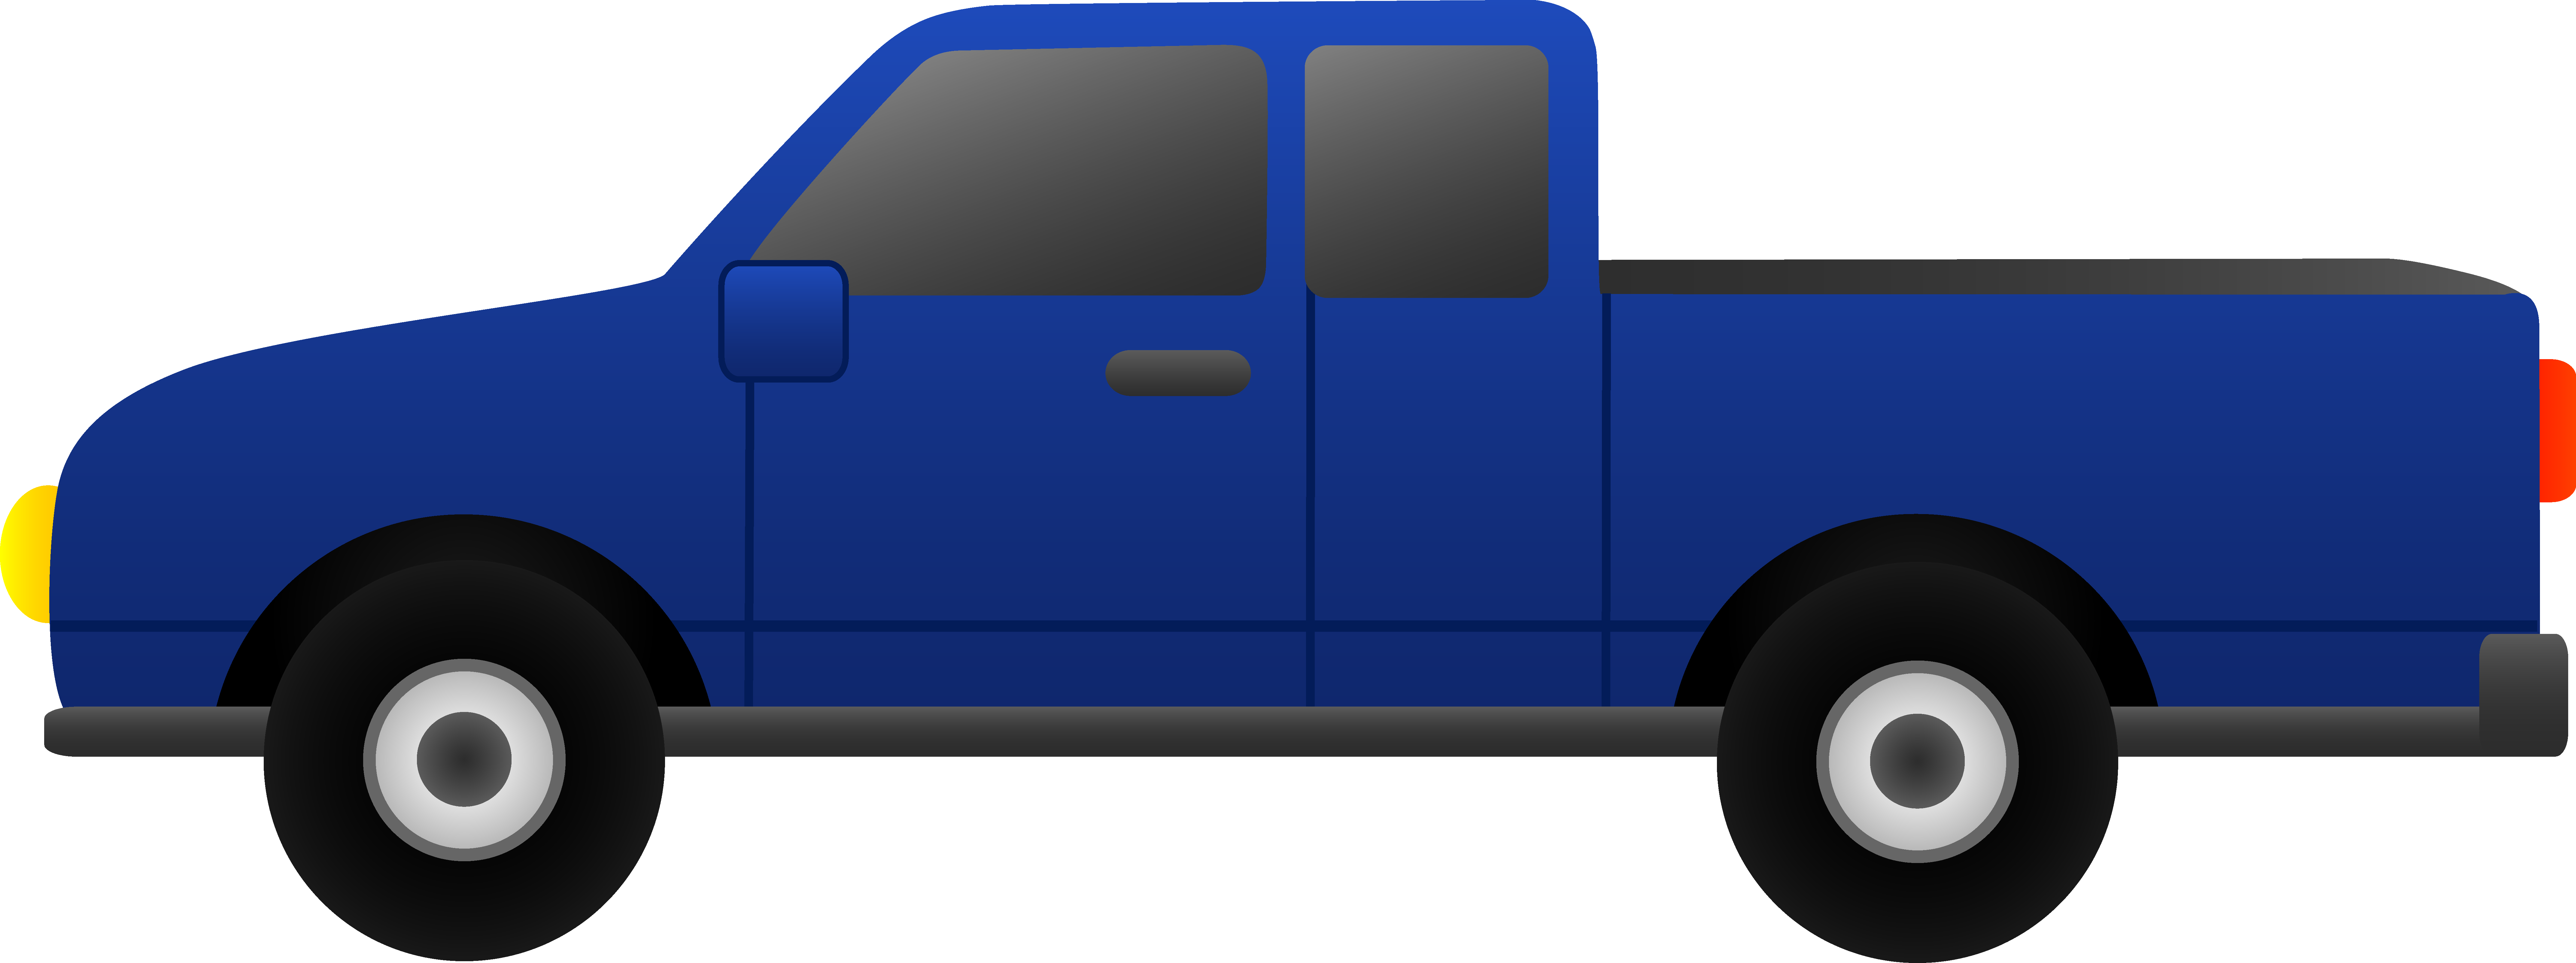 8576x3207 Vehicle Clipart Pickup Truck